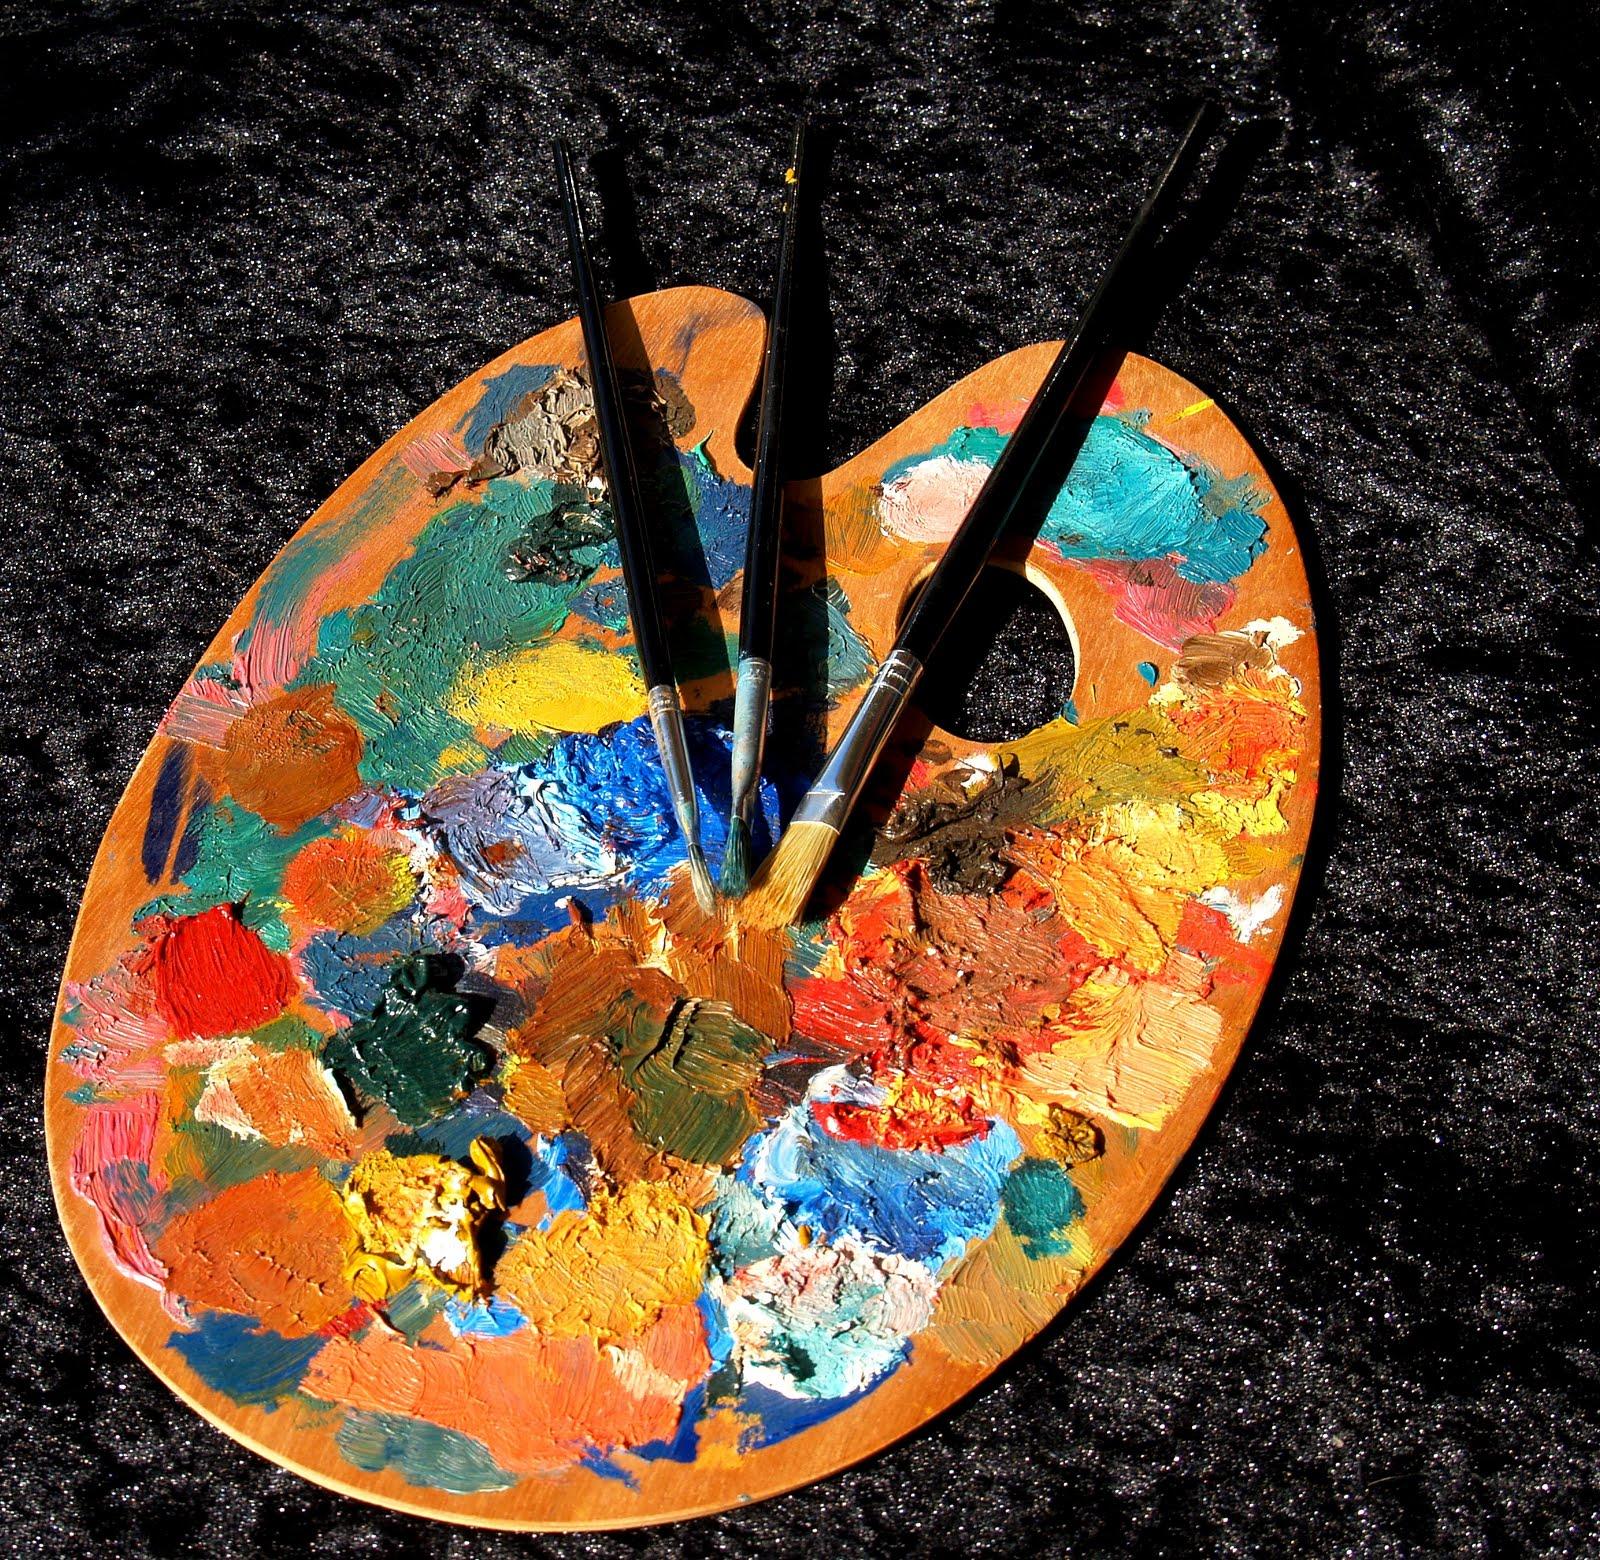 H art colores en la paleta de pintores for Paleta colores pintura pared